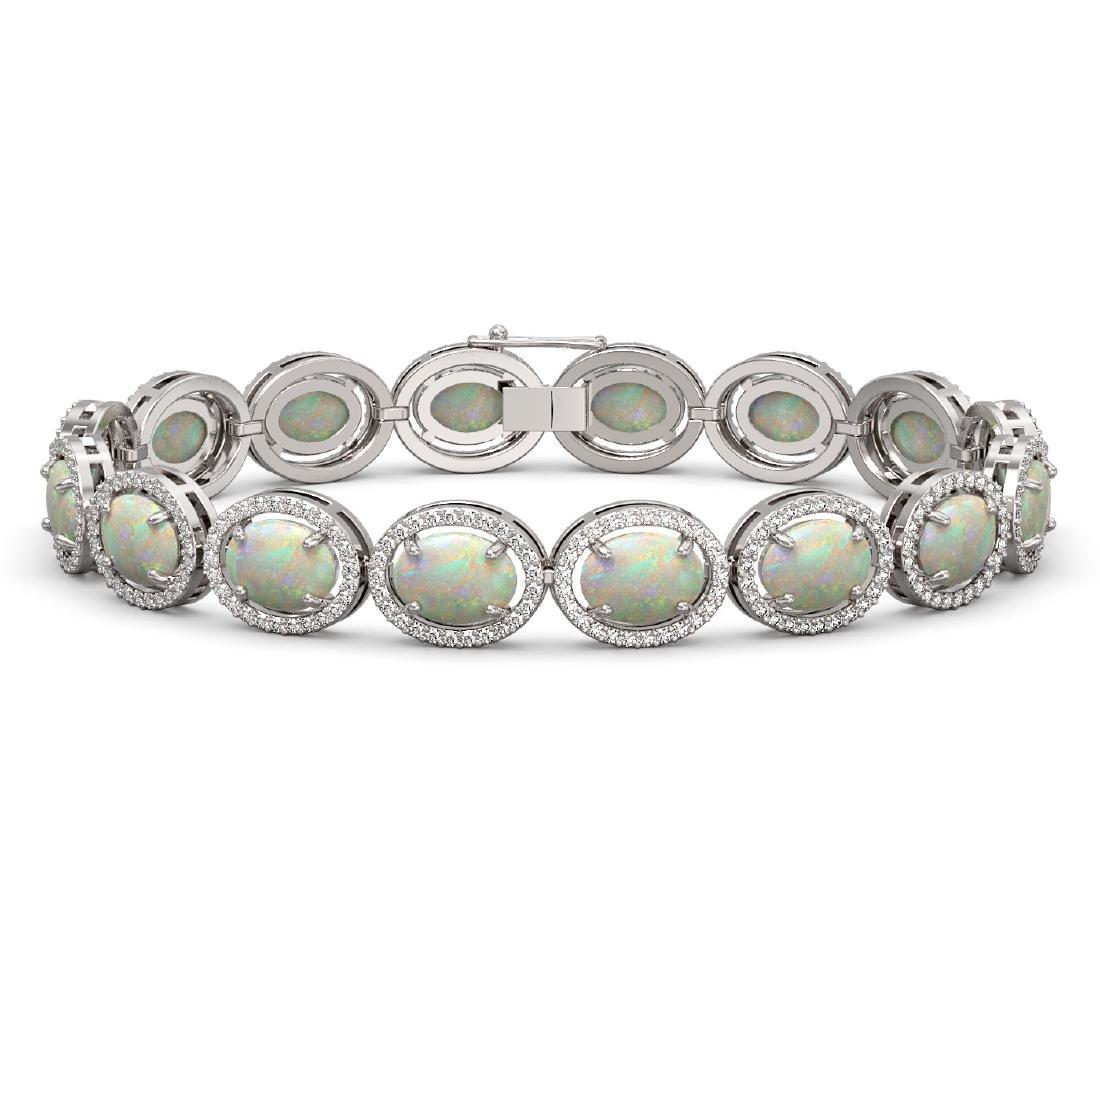 18.33 CTW Opal & Diamond Halo Bracelet 10K White Gold